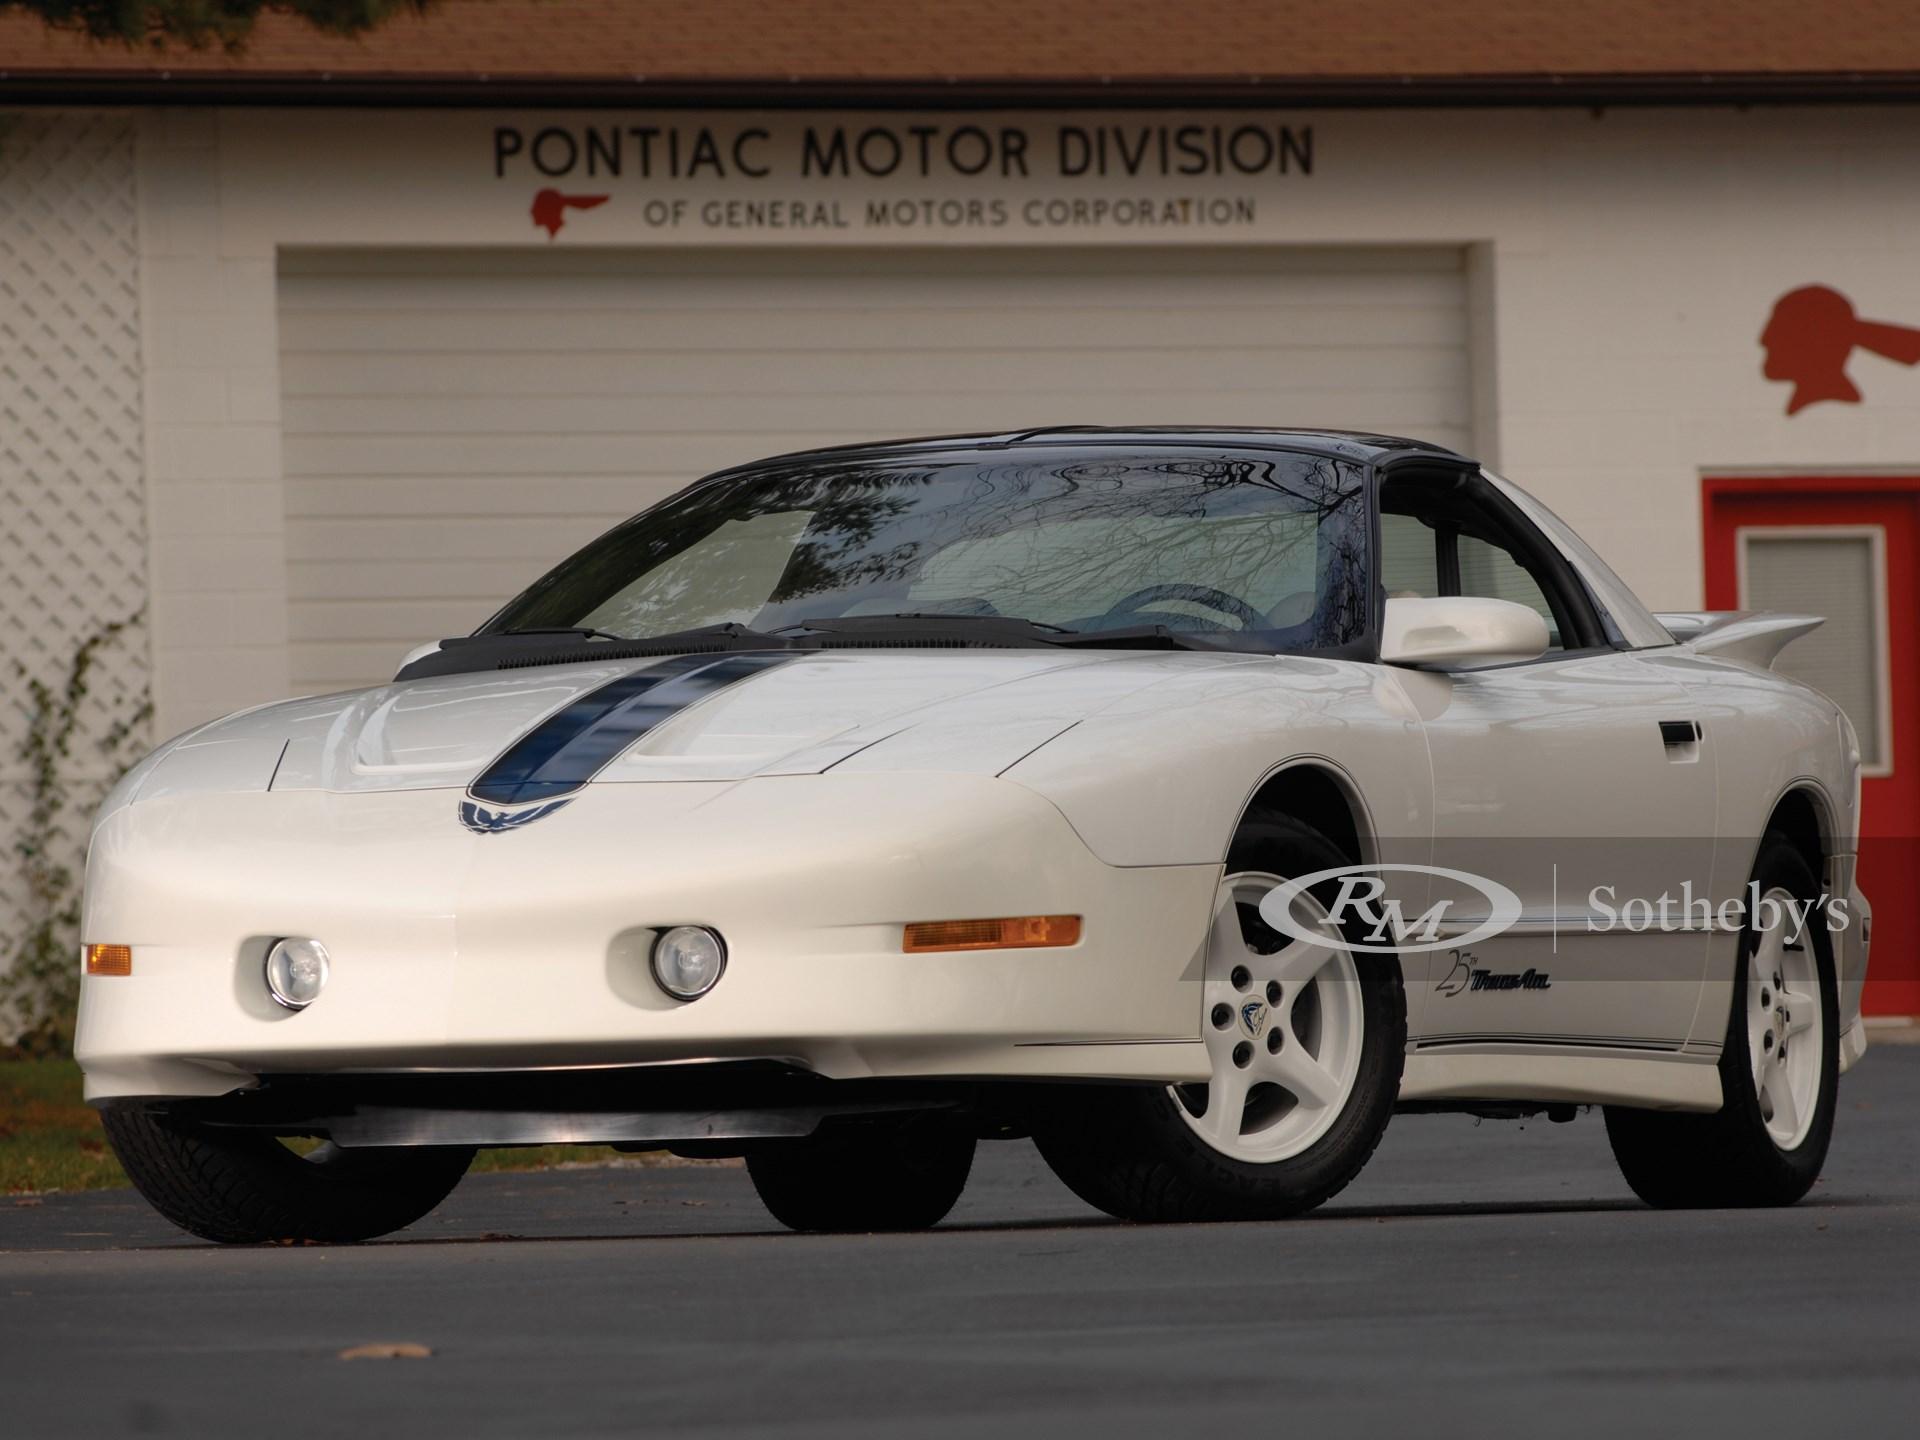 1994 Pontiac Trans Am 25th Anniversary Edition